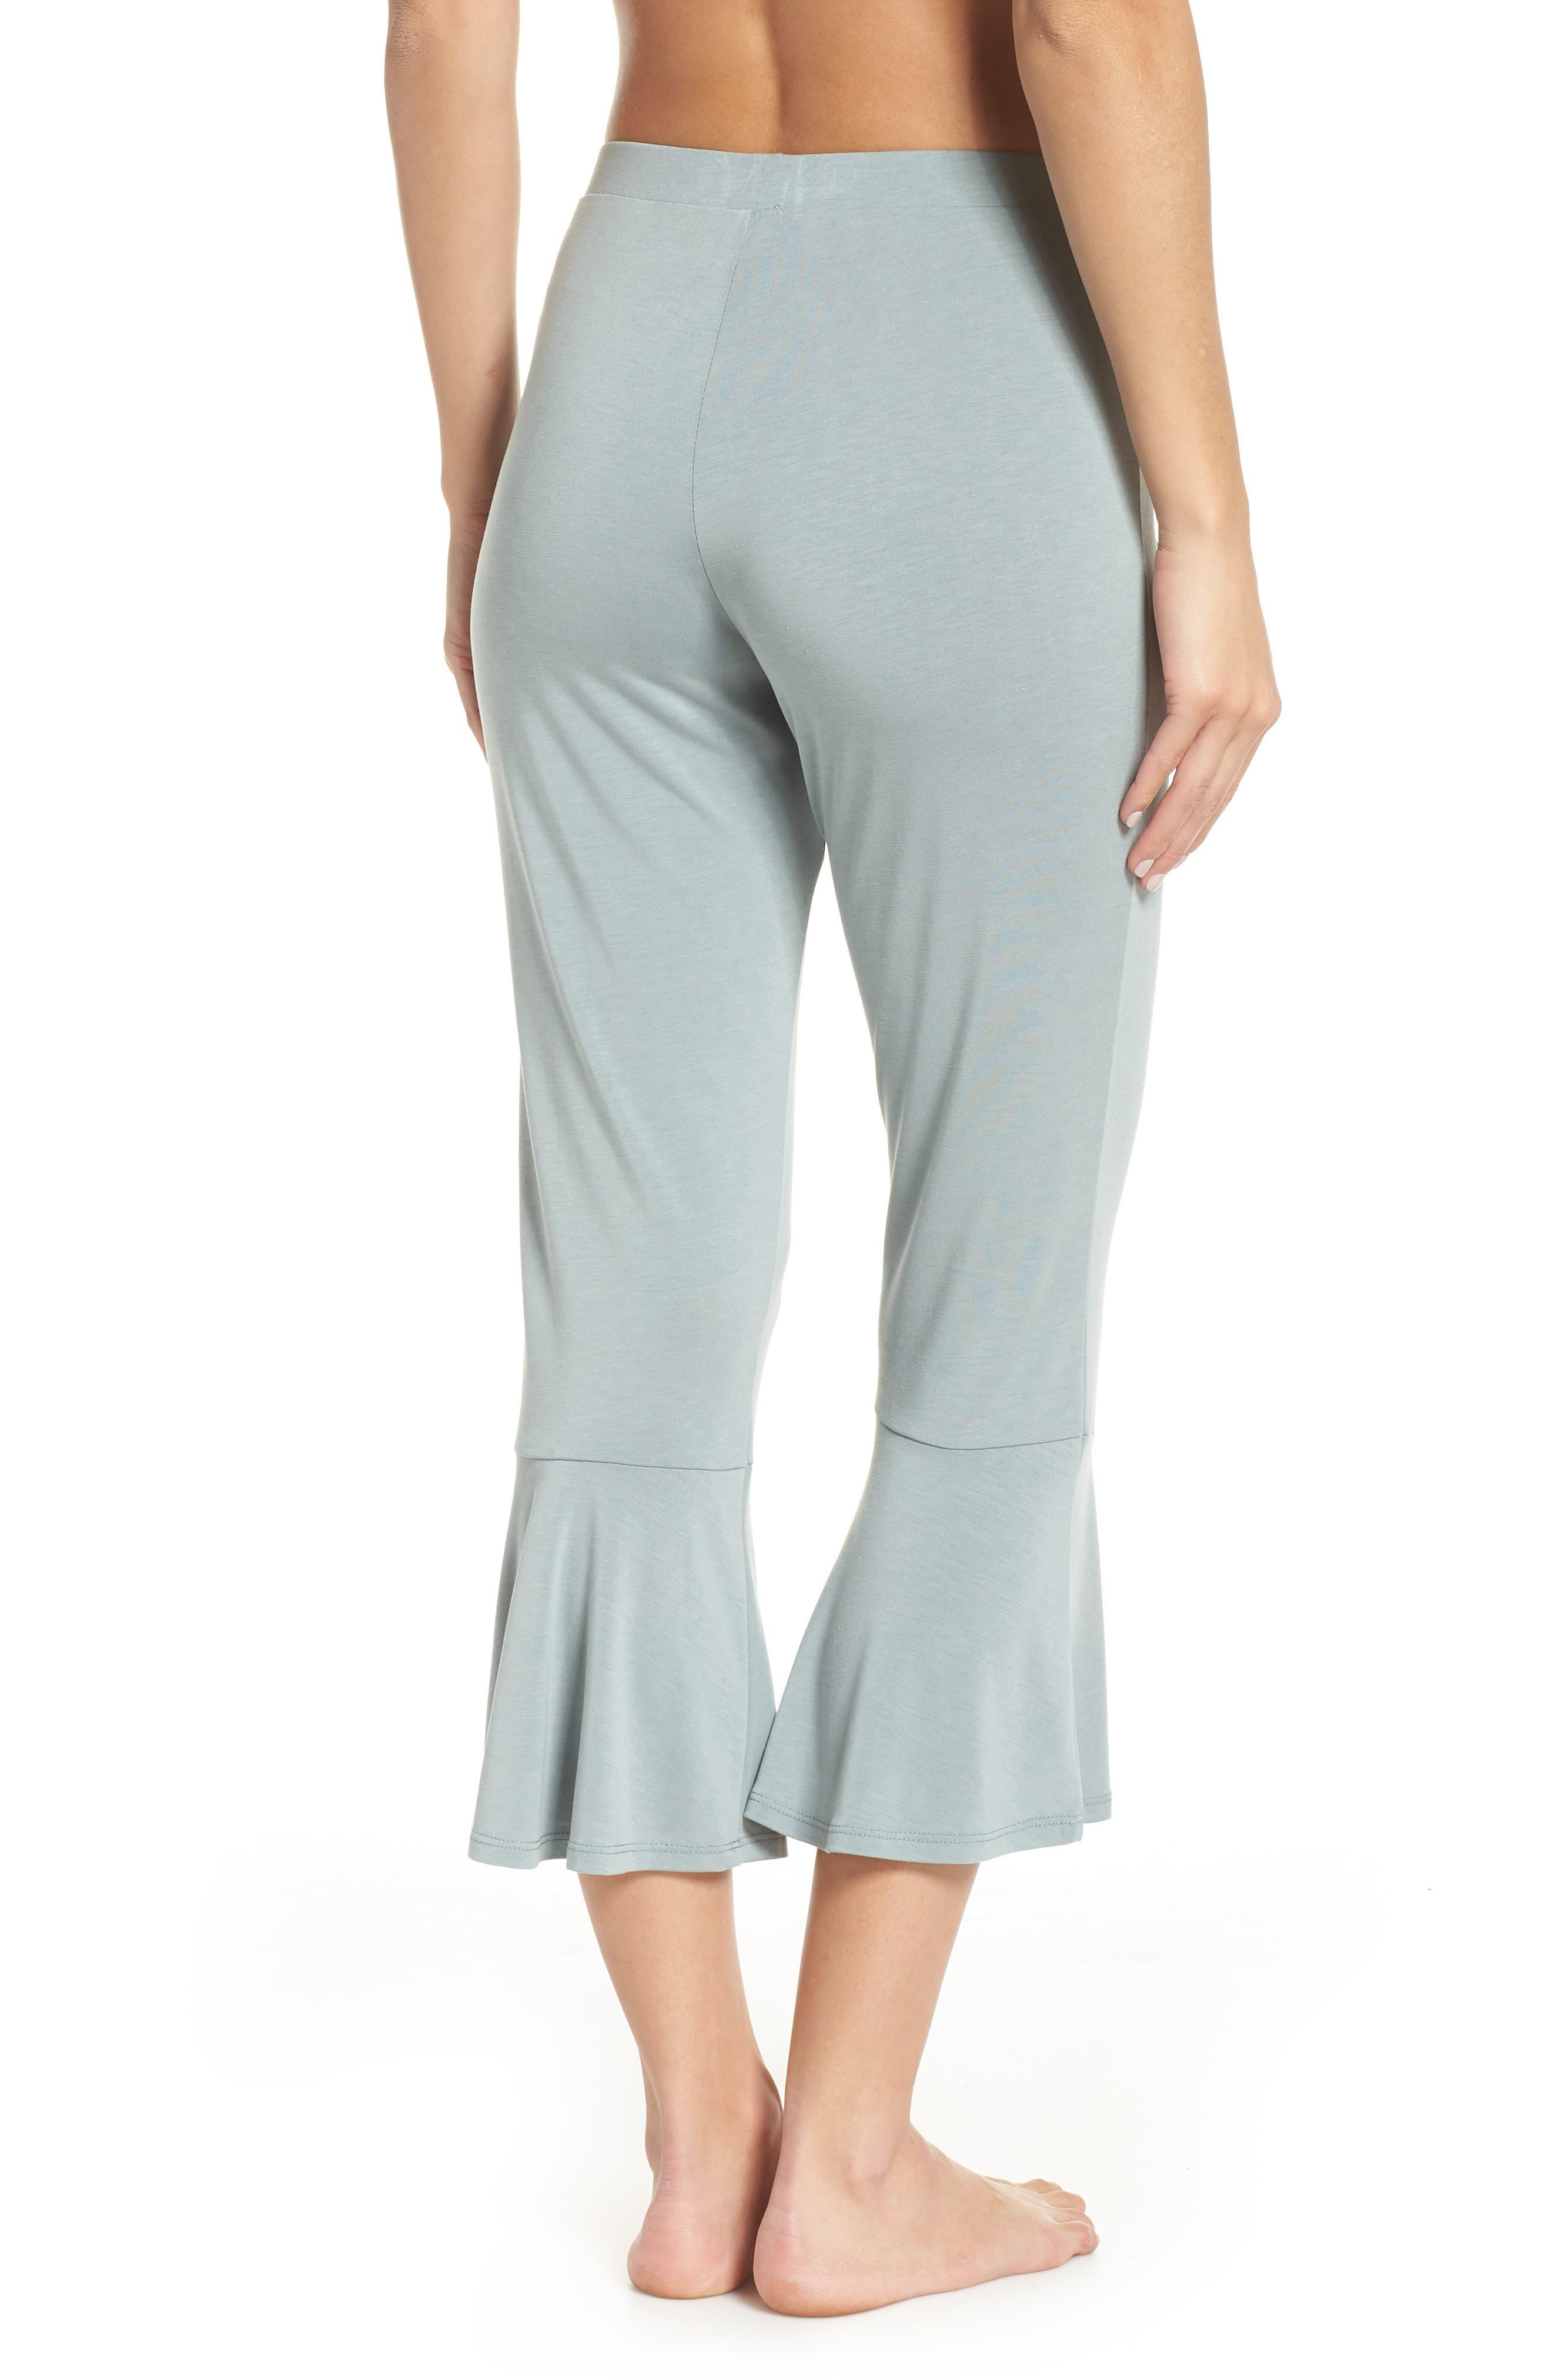 Aden Ruffle Hem Lounge Pants,                             Alternate thumbnail 2, color,                             MINERAL SAGE